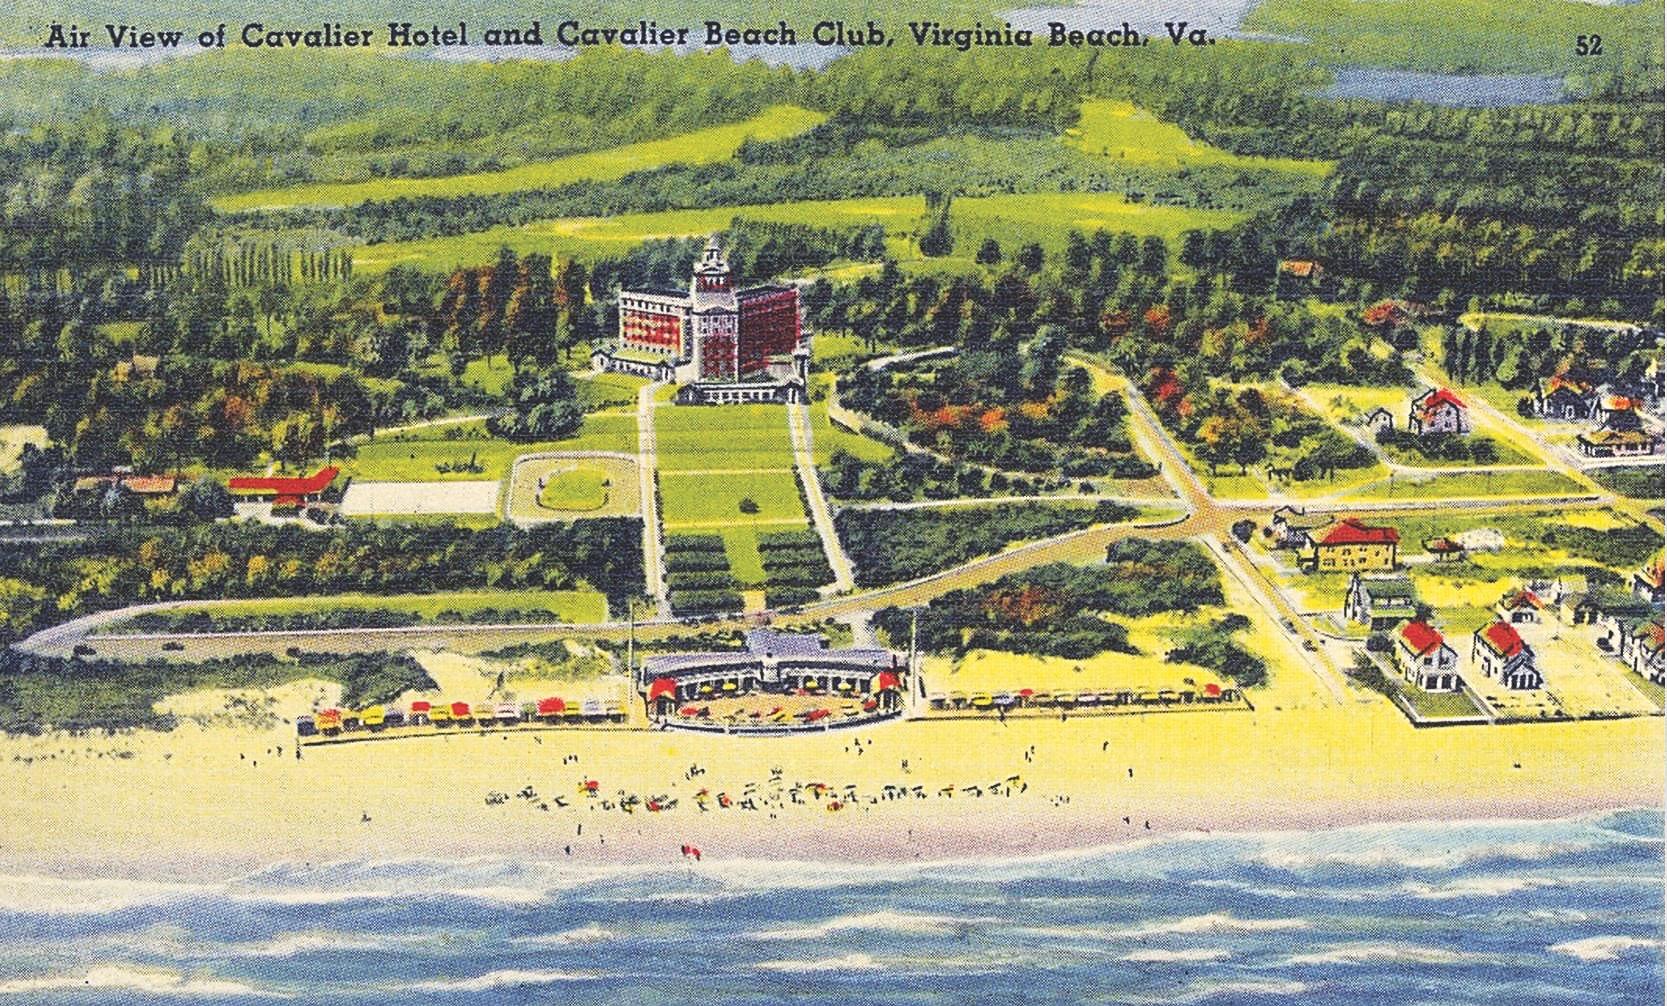 Cavalier Hotel, Virginia Beach